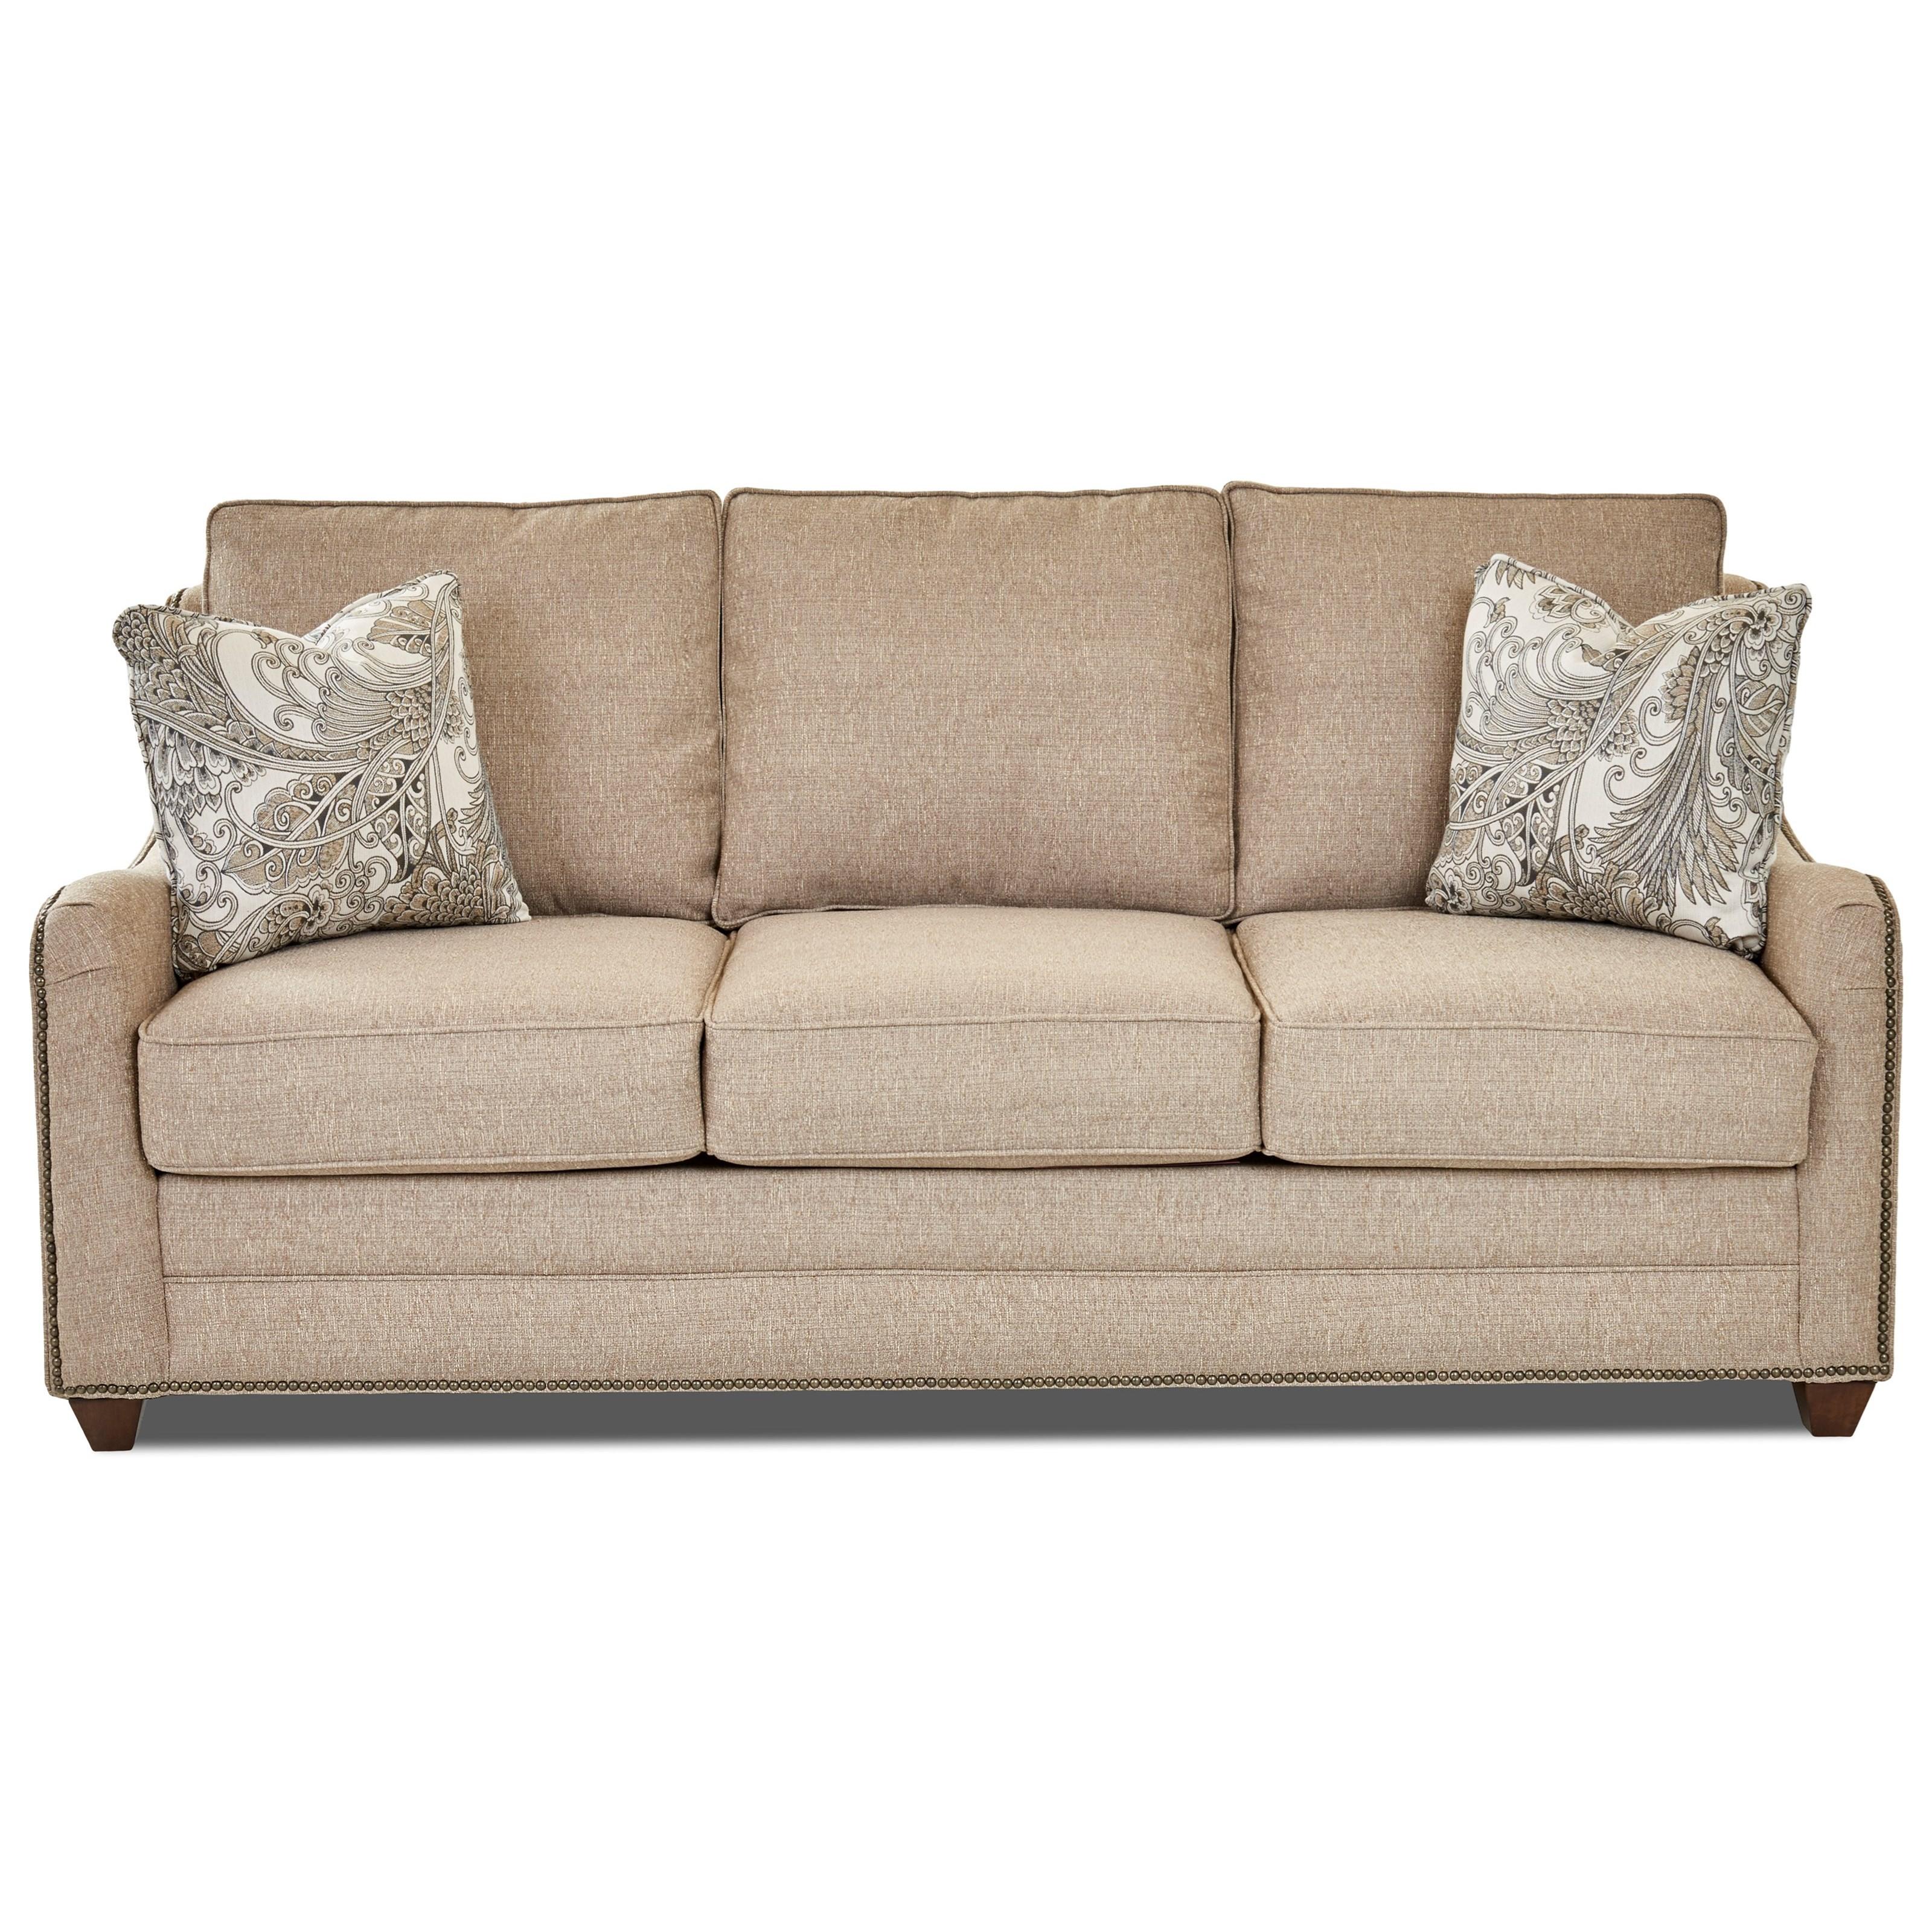 Klaussner Kyler Casual Sleeper Sofa With Enso Memory Foam Mattress